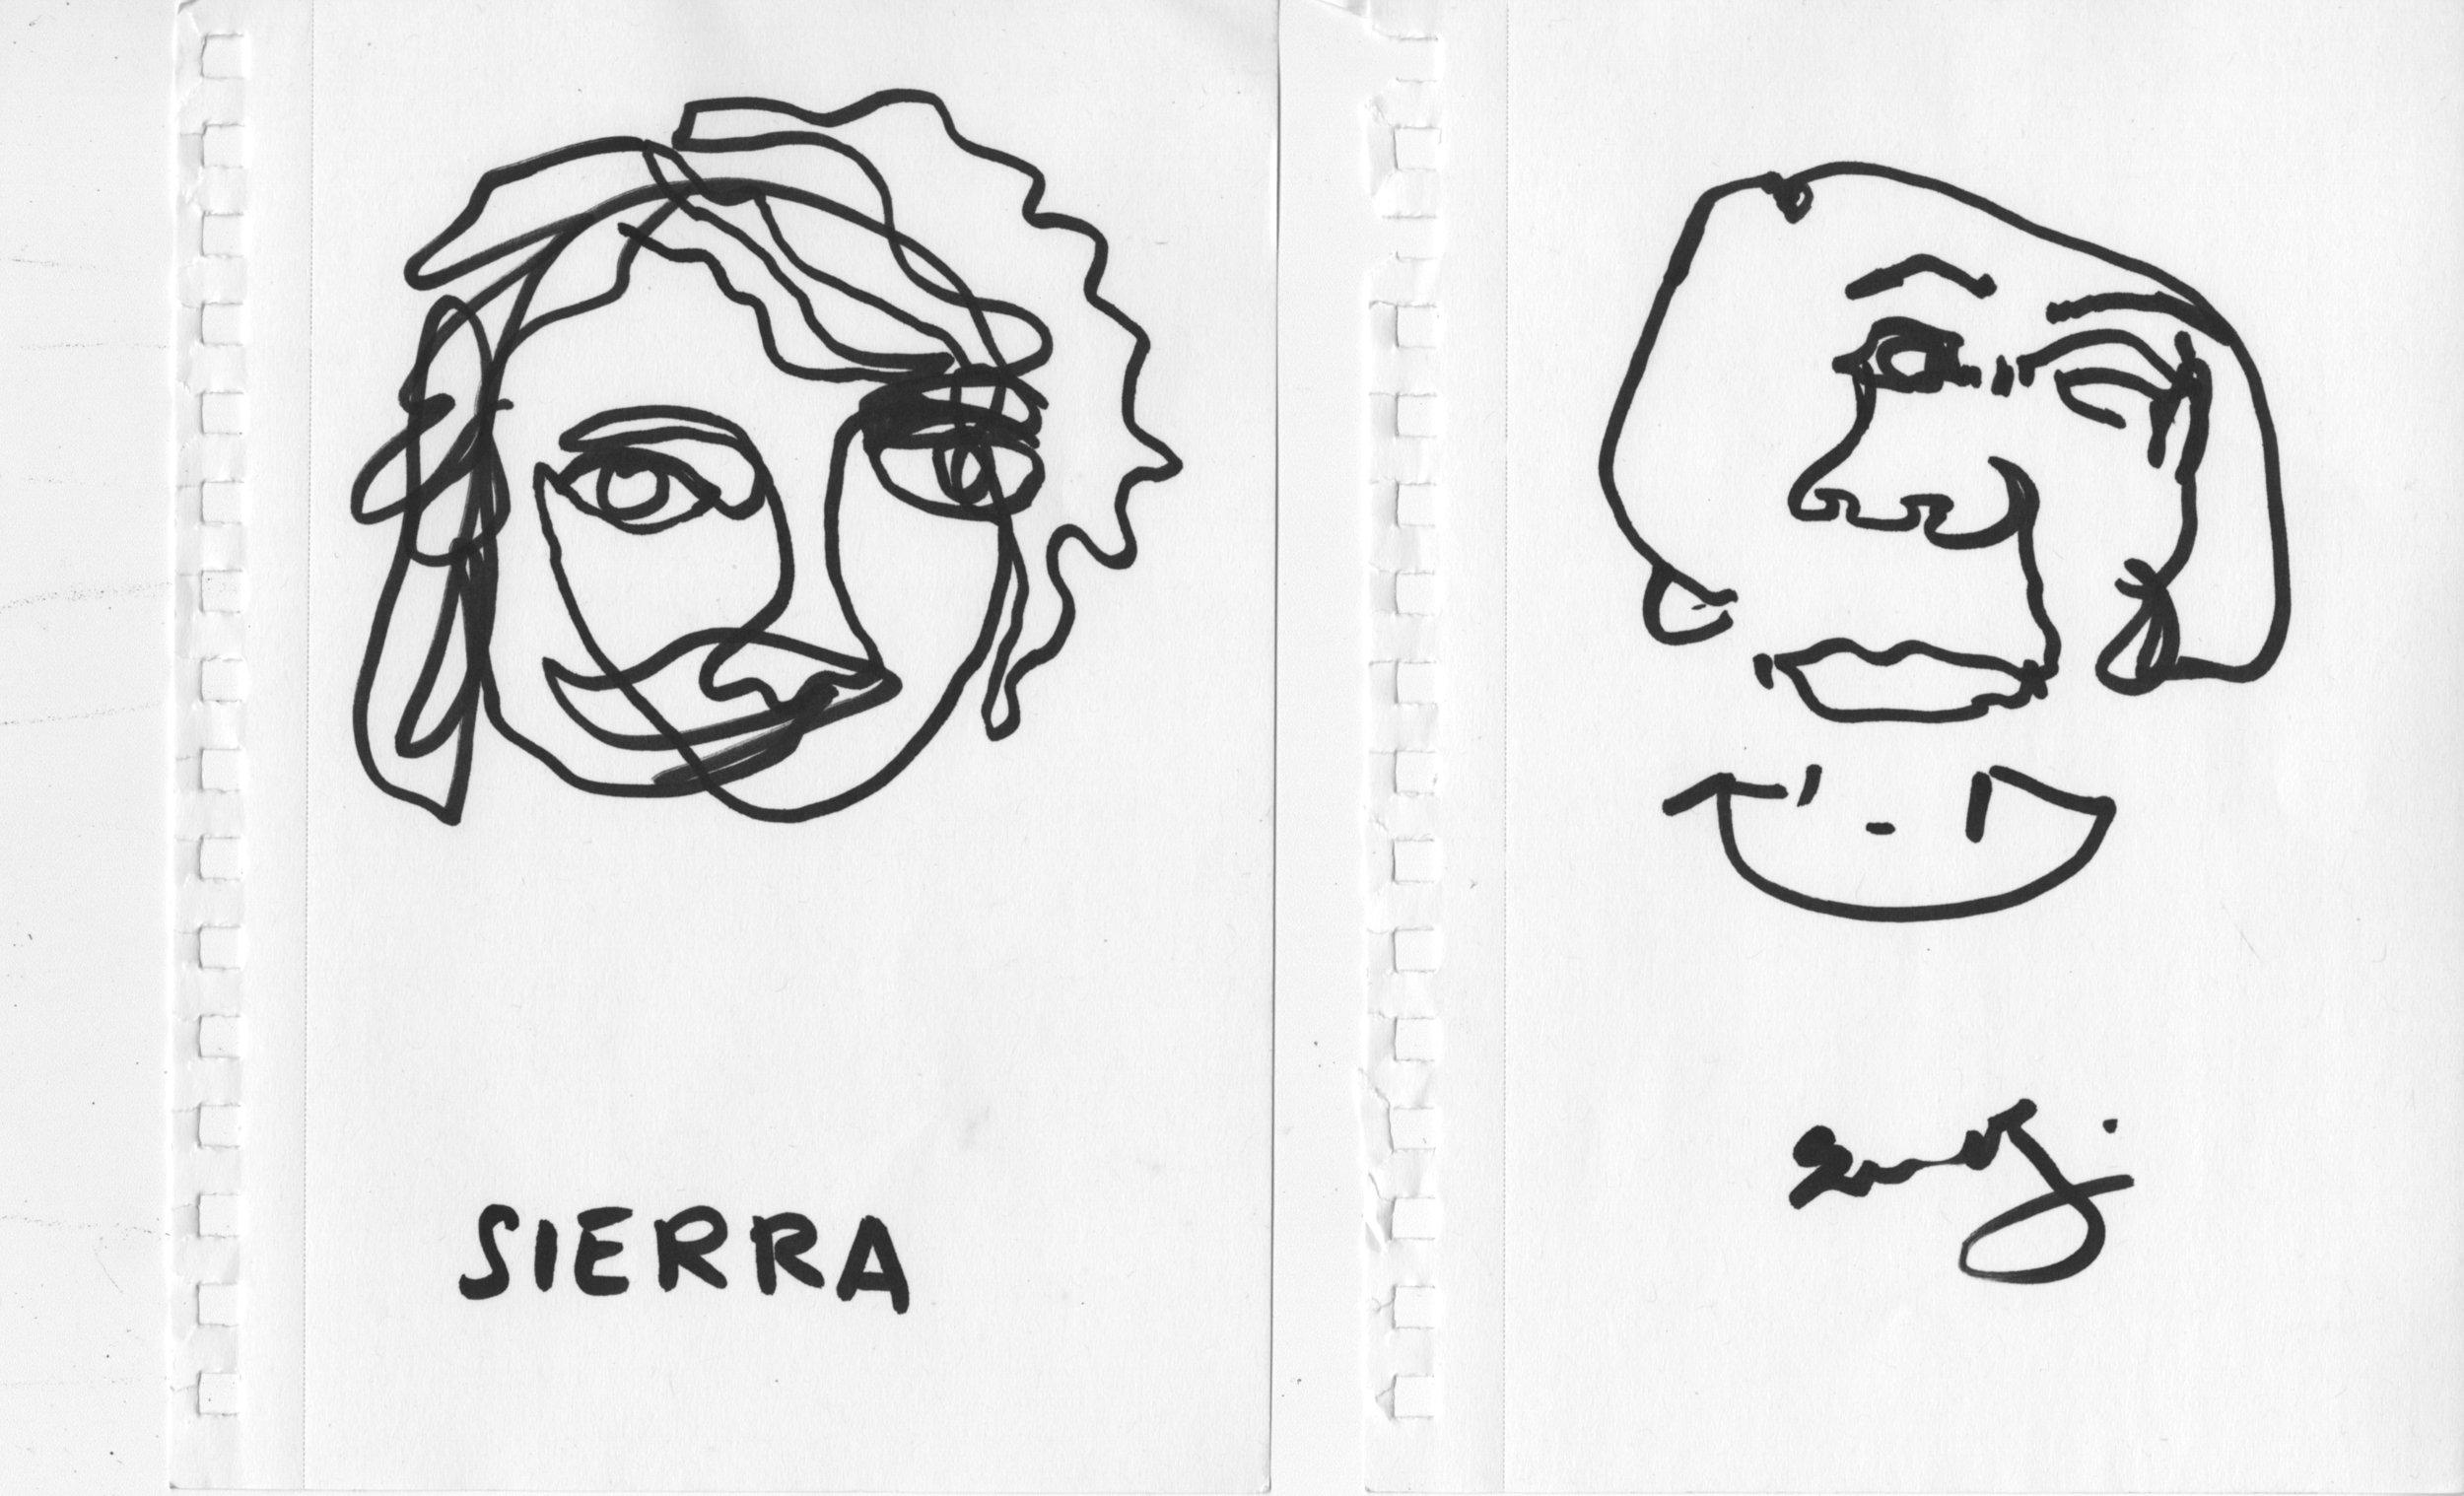 16_Sierra Reading_Sierra.jpg